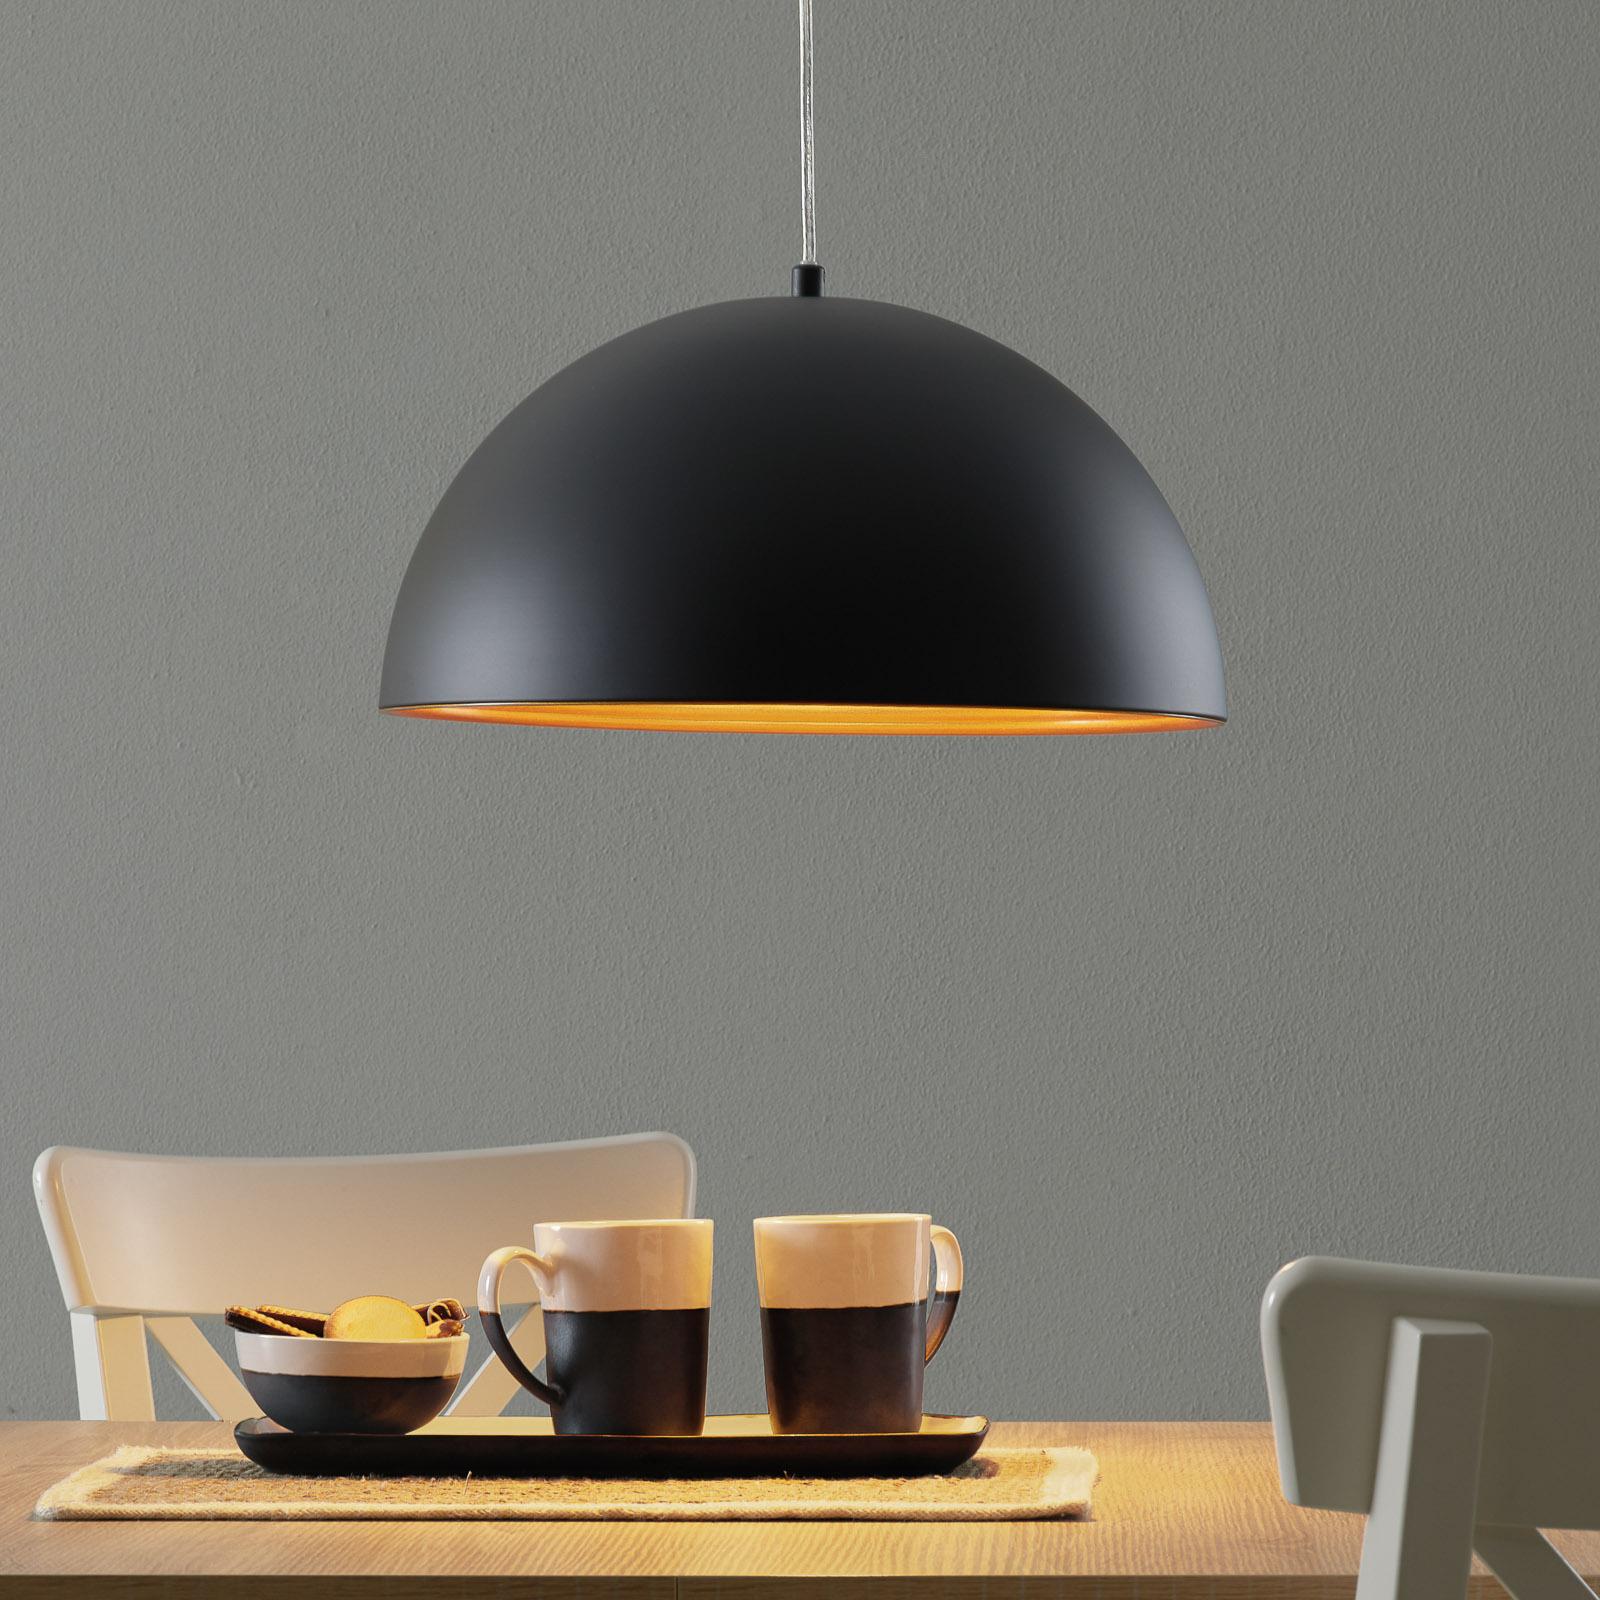 Lámpara colgante Dingle bicolor negro-dorado